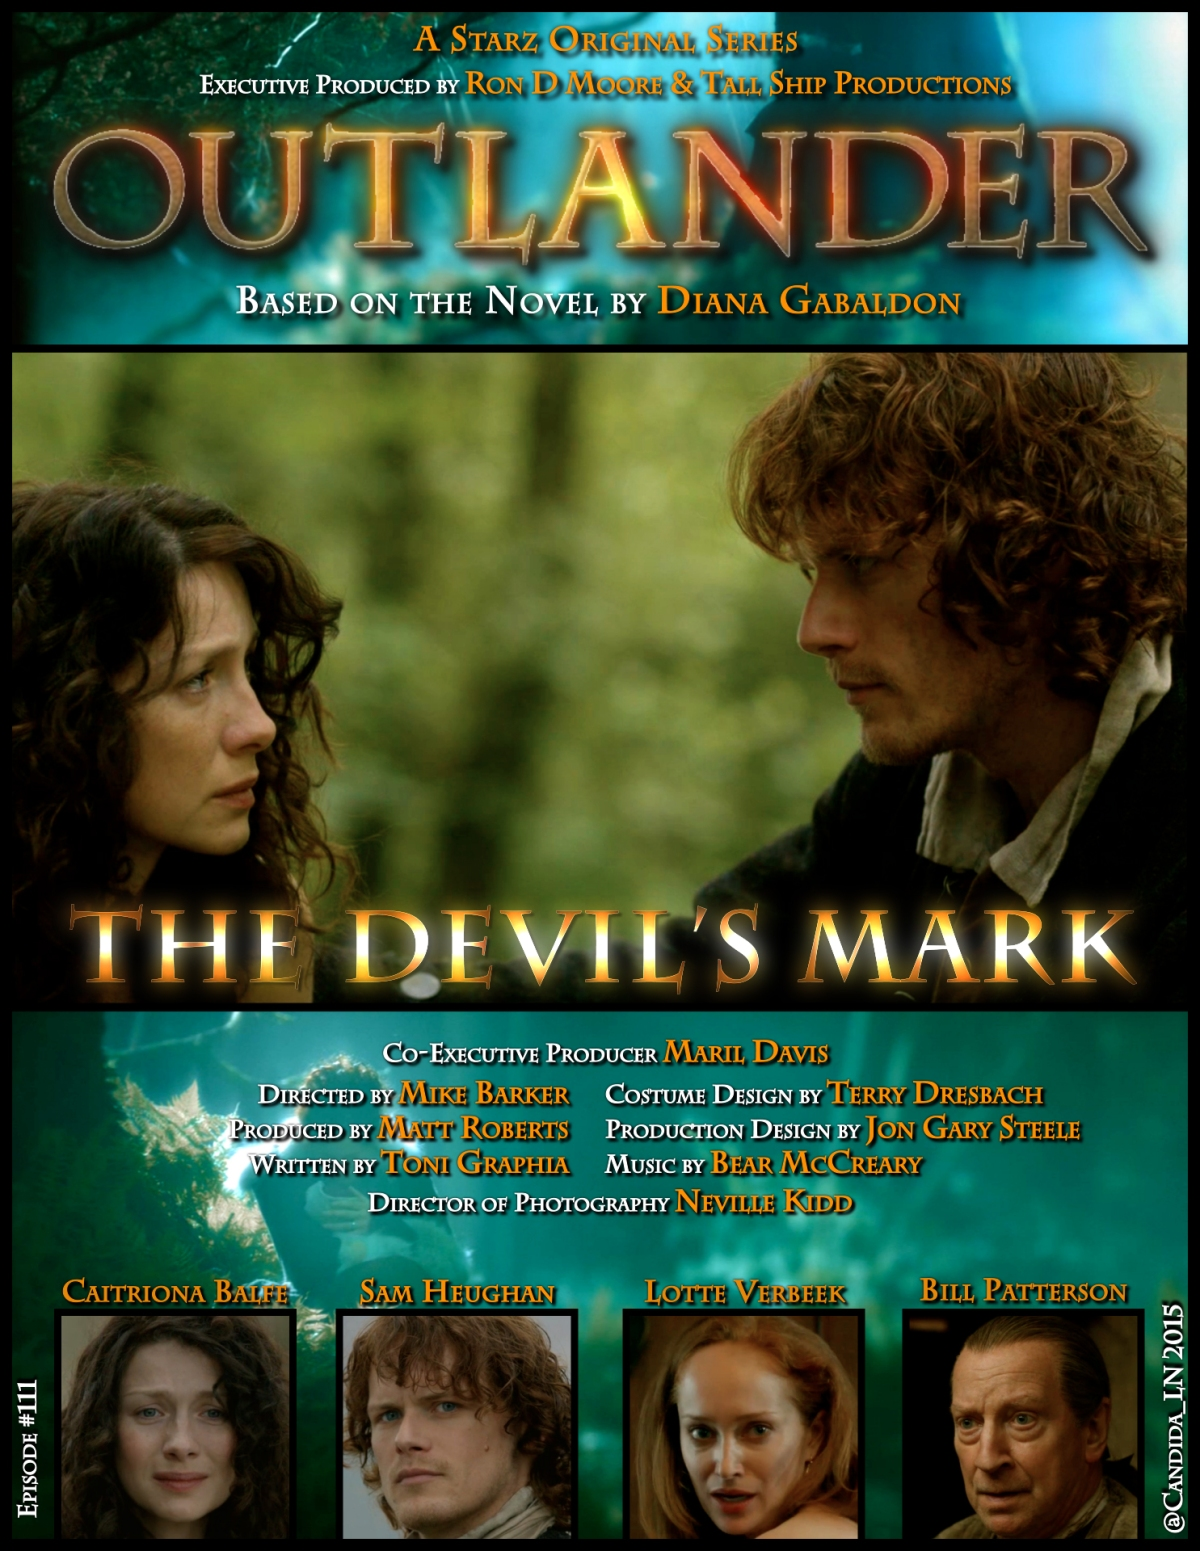 #111_Devil's_Mark_Poster